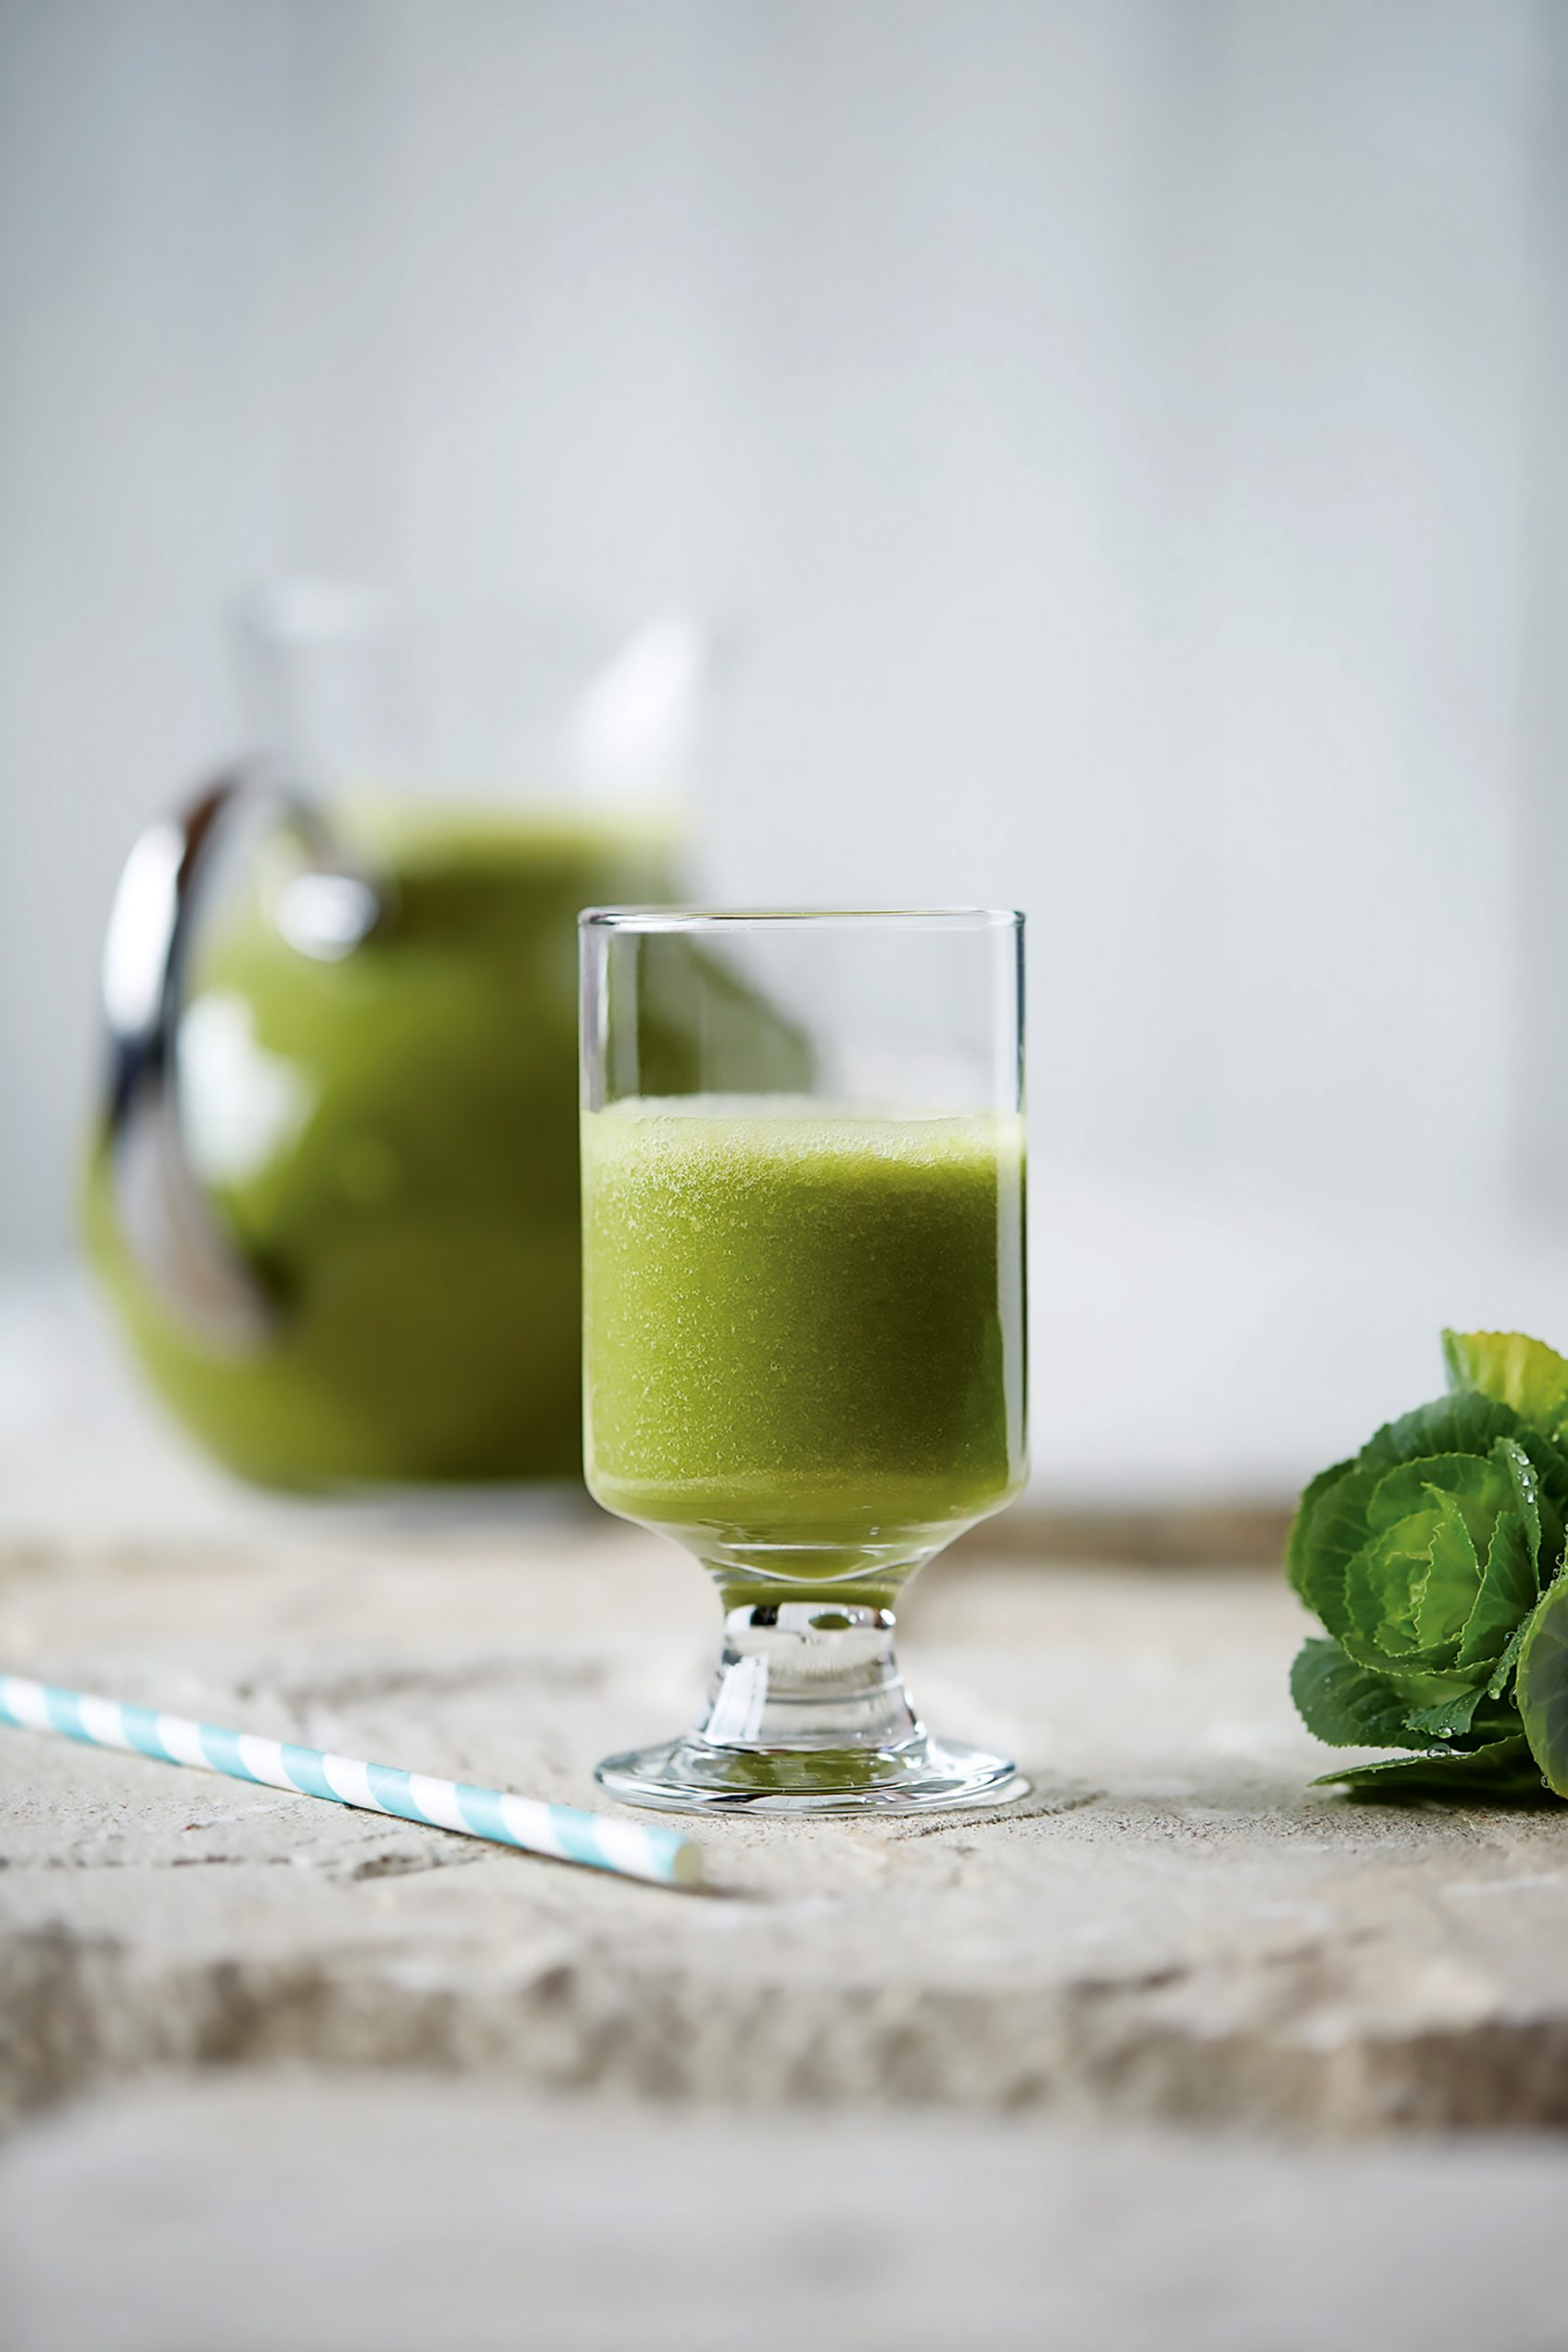 Lecker und gesund: Avocado-Zitrus-Smoothie mit Moringa